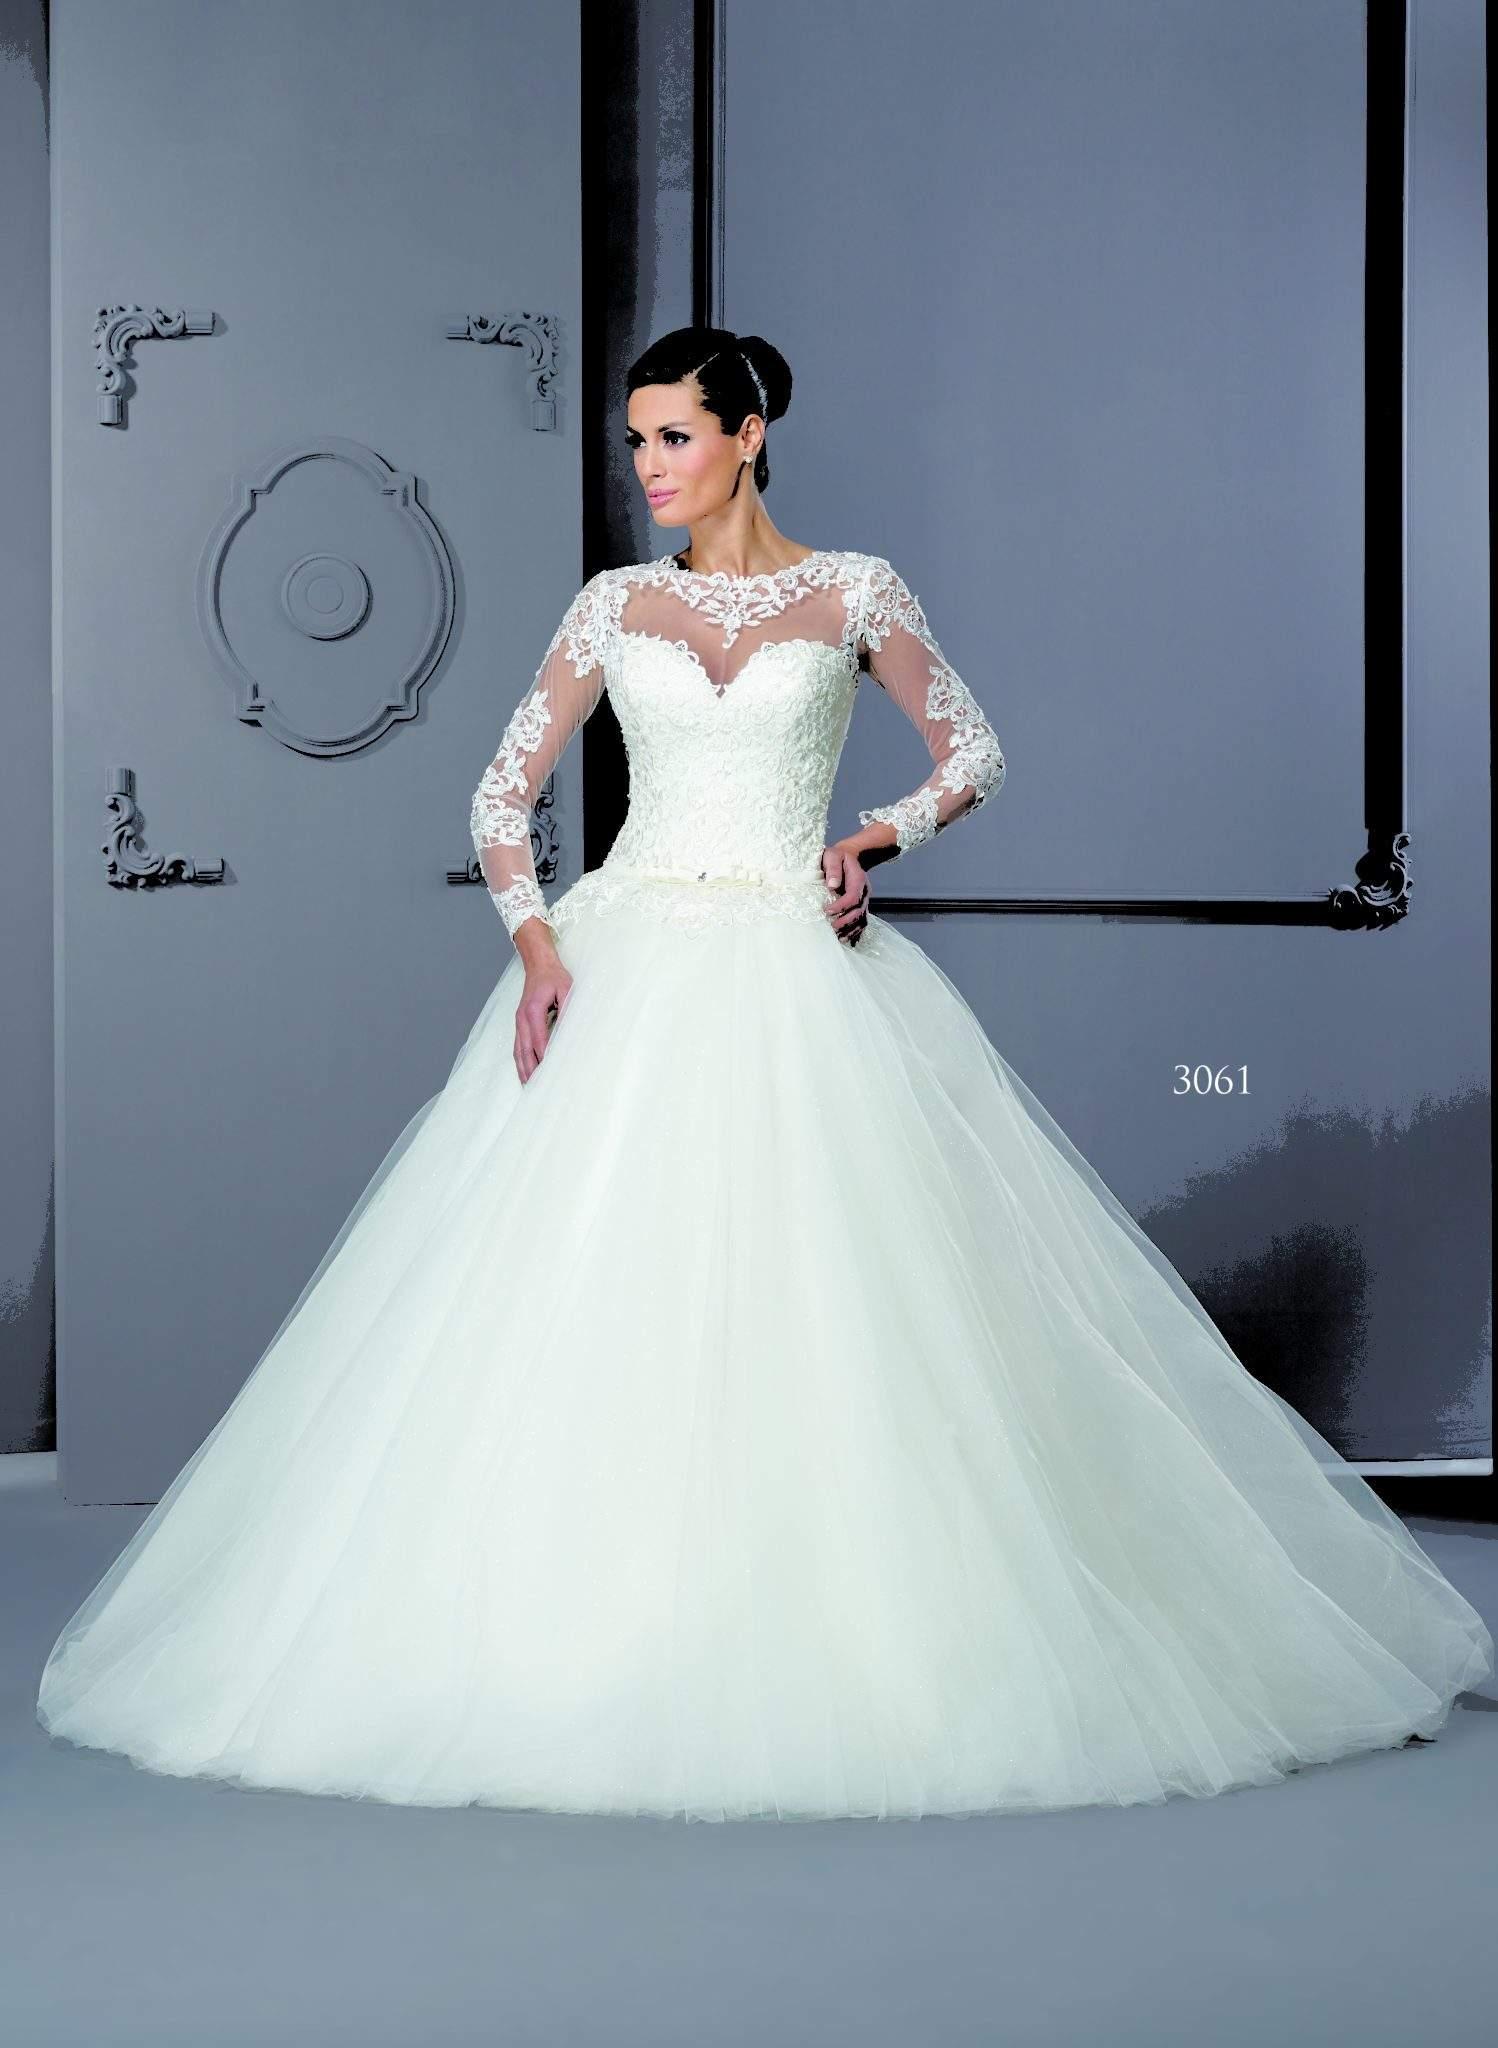 Long Sleeve Church Wedding Dresses - Darius Cordell Fashion Ltd